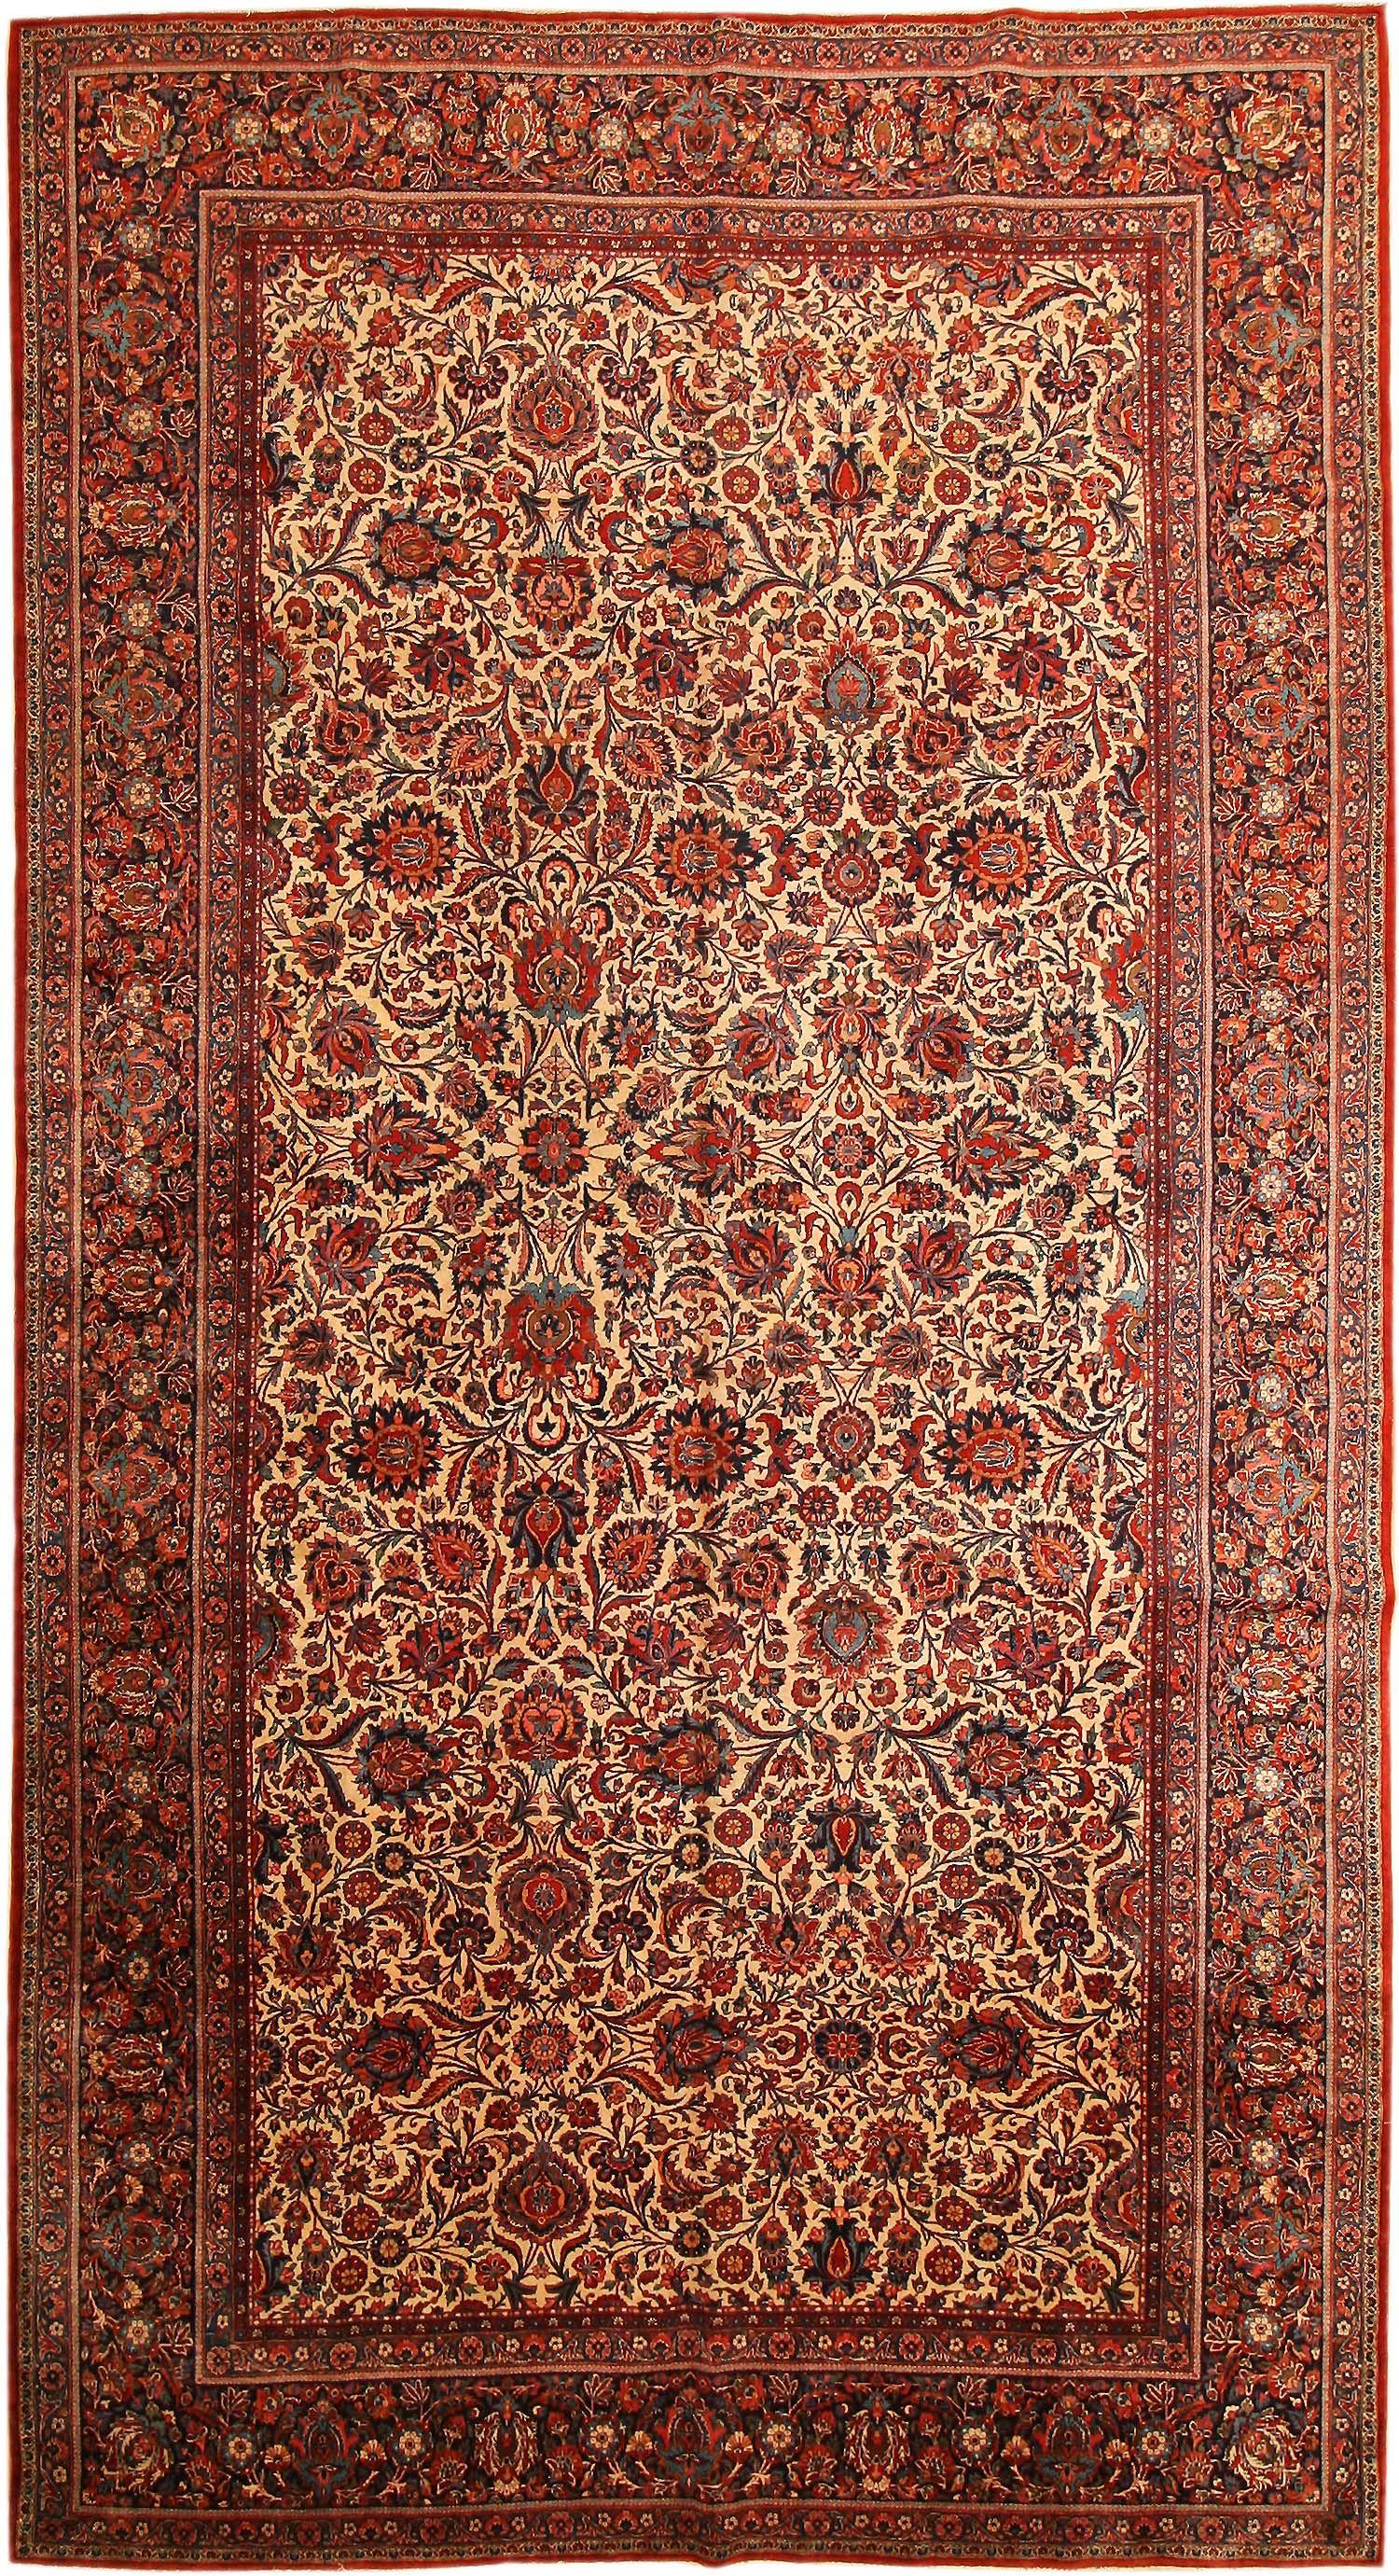 Pictures Of Antique Rugs Perzisch